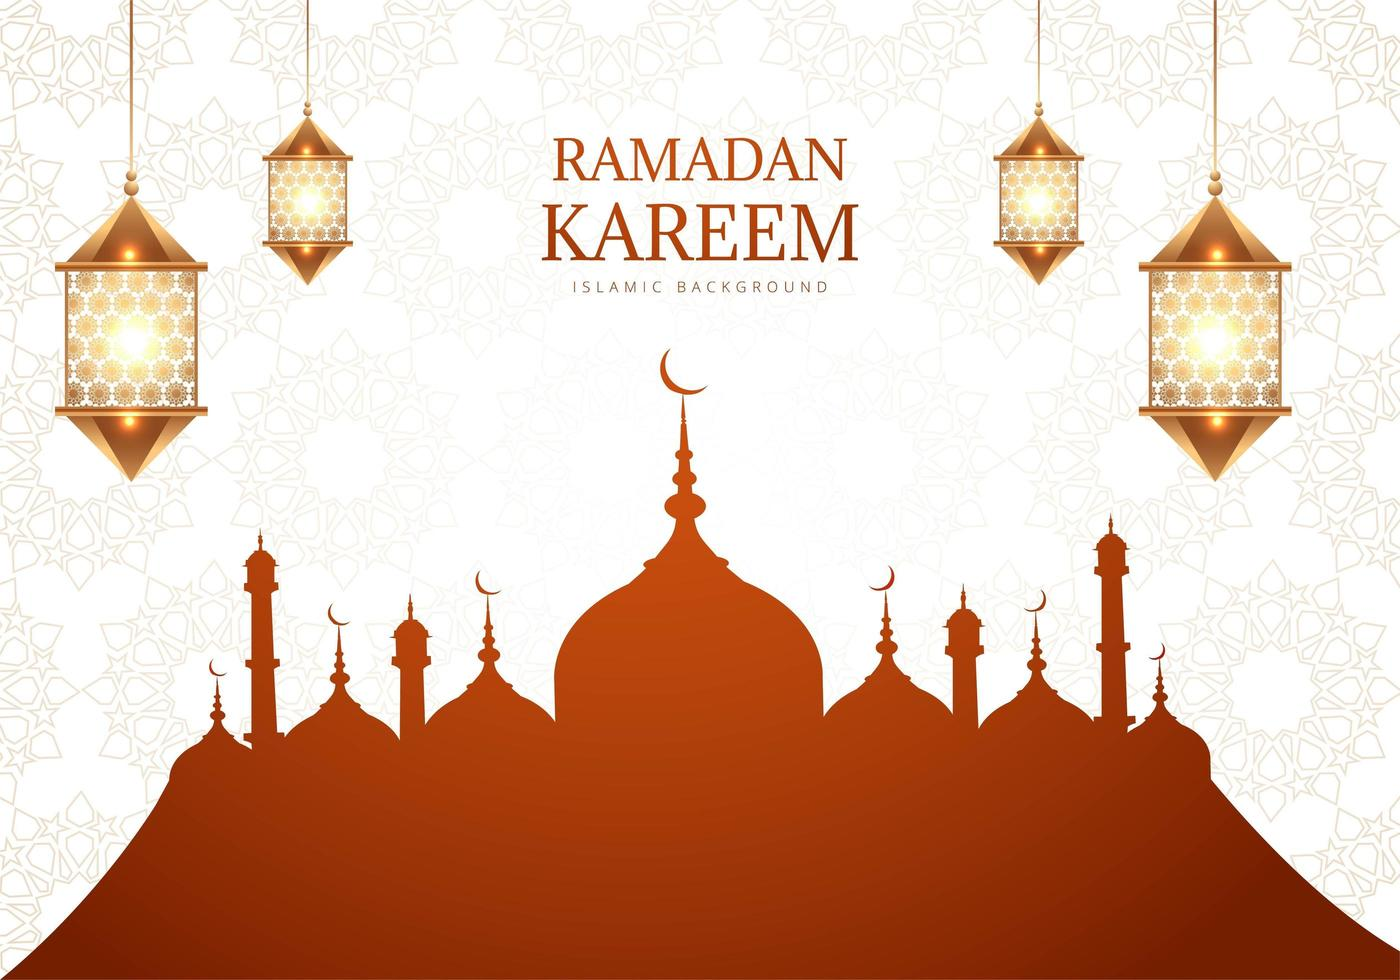 Ramadan Kareem Greeting with Brown Mosque Silhouette  vector